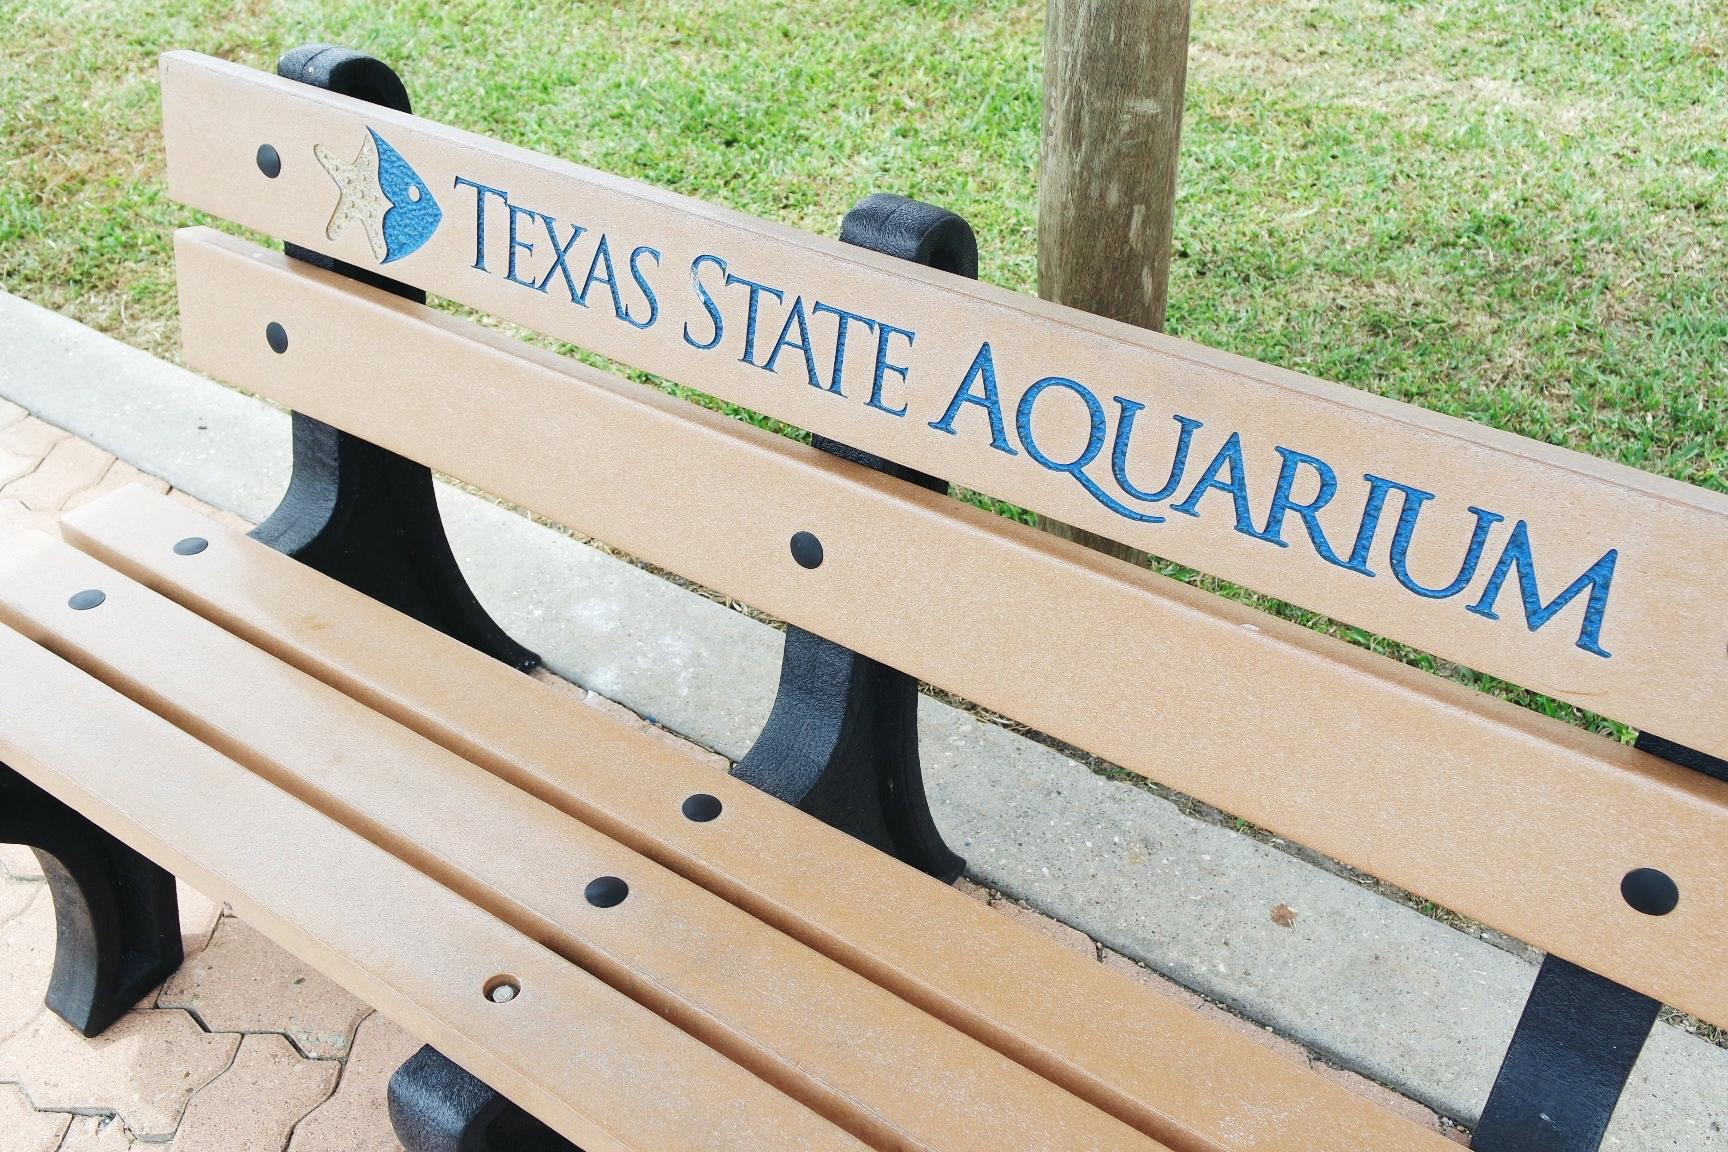 TexasStateAquarium10.jpg